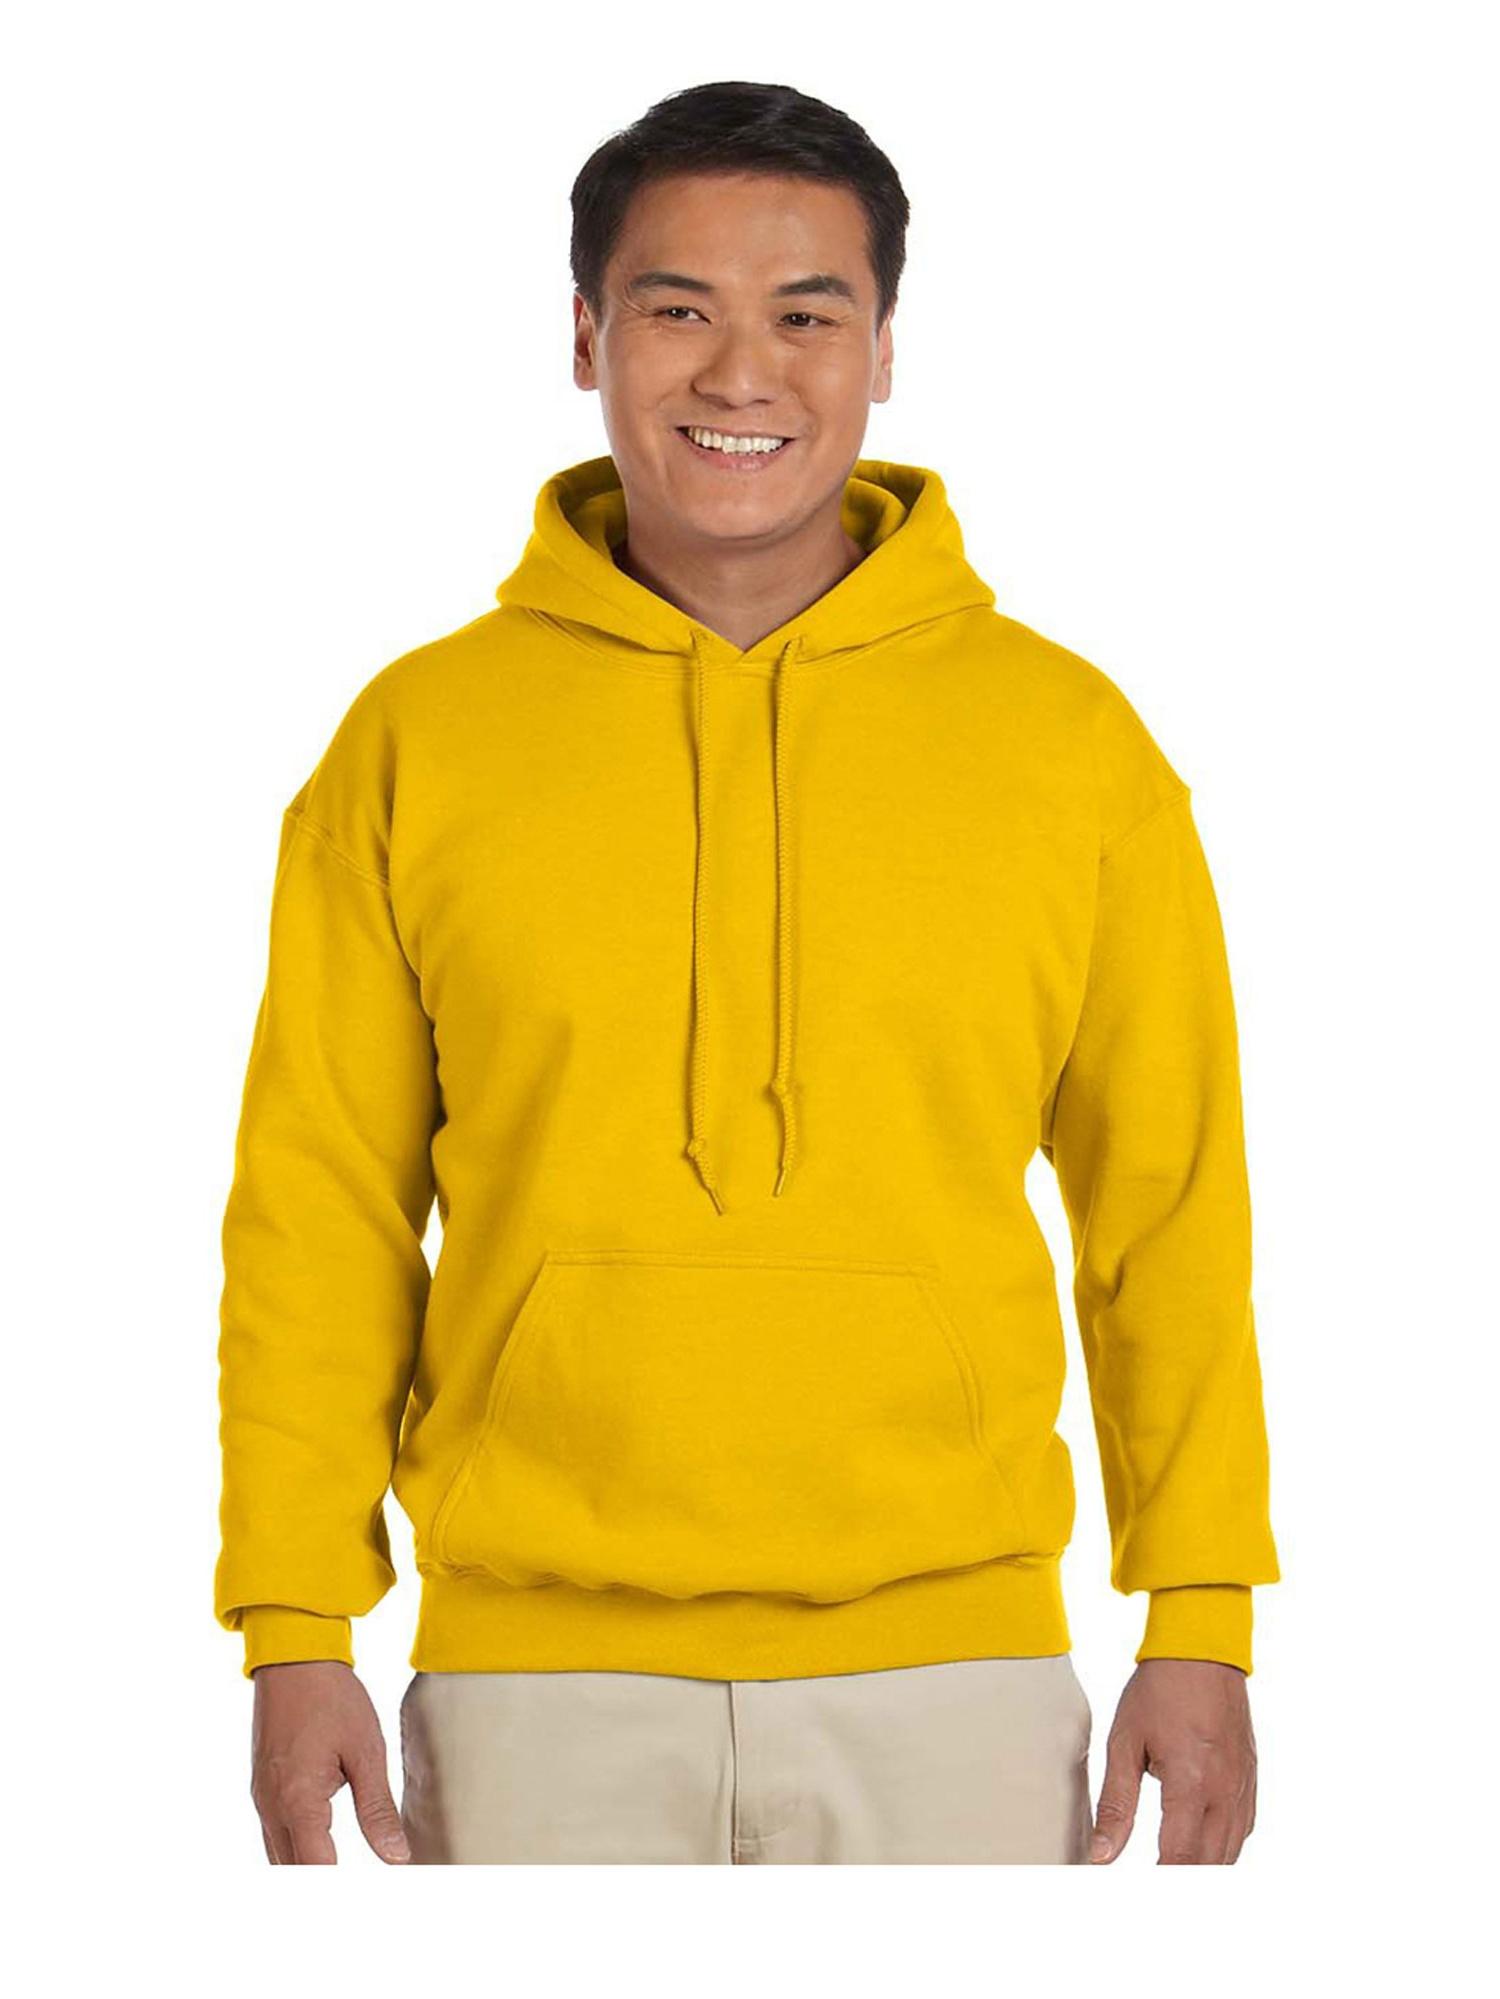 Gildan Men's Rib Knit Pouch Pocket Hooded Sweatshirt, Style G18500